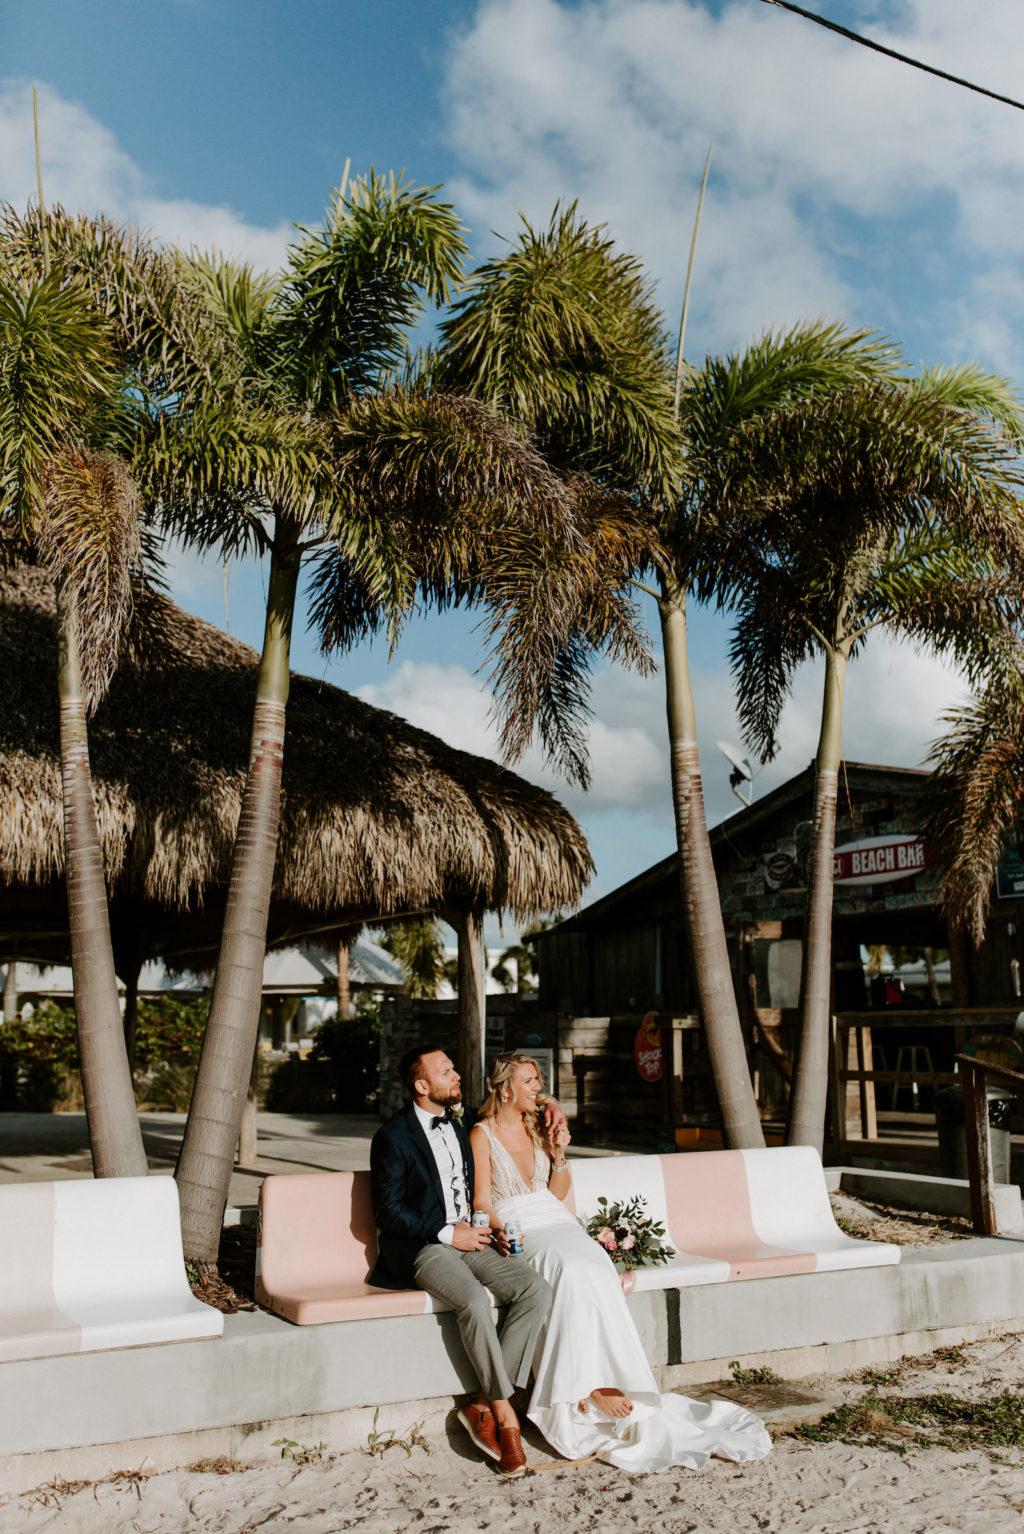 Florida Bride and Groom Sitting on Bench of Sandy Beach   St. Pete Wedding Venue Postcard Inn on the Beach